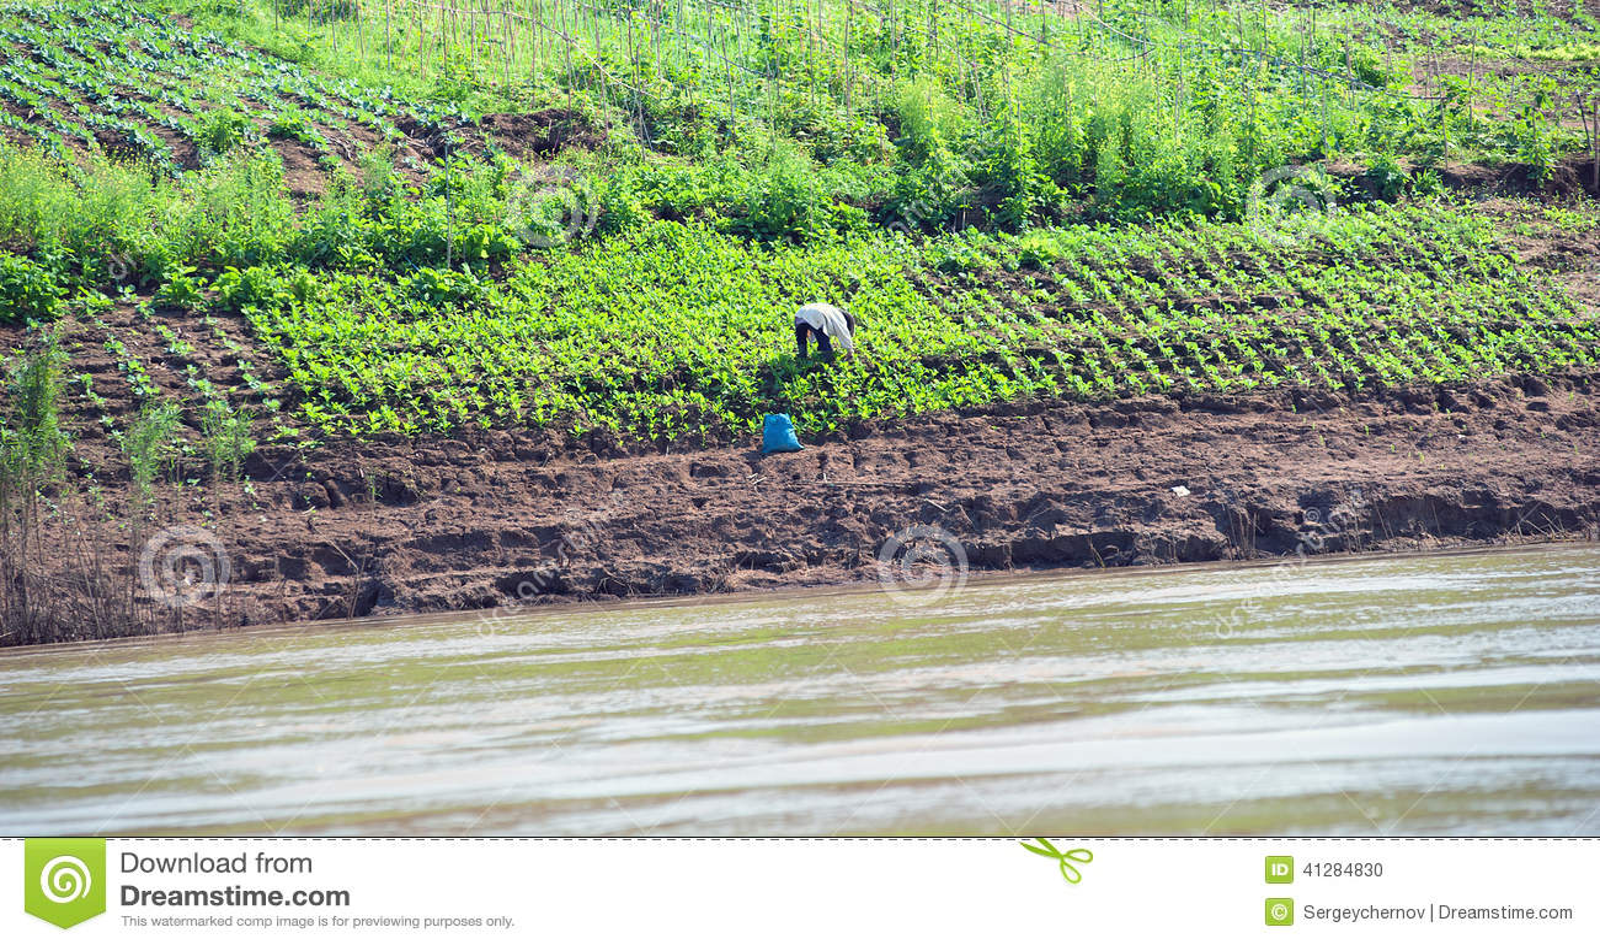 Growing Crops On River Banks. Mekong River Cruise Stock Photo - Image: 41284830